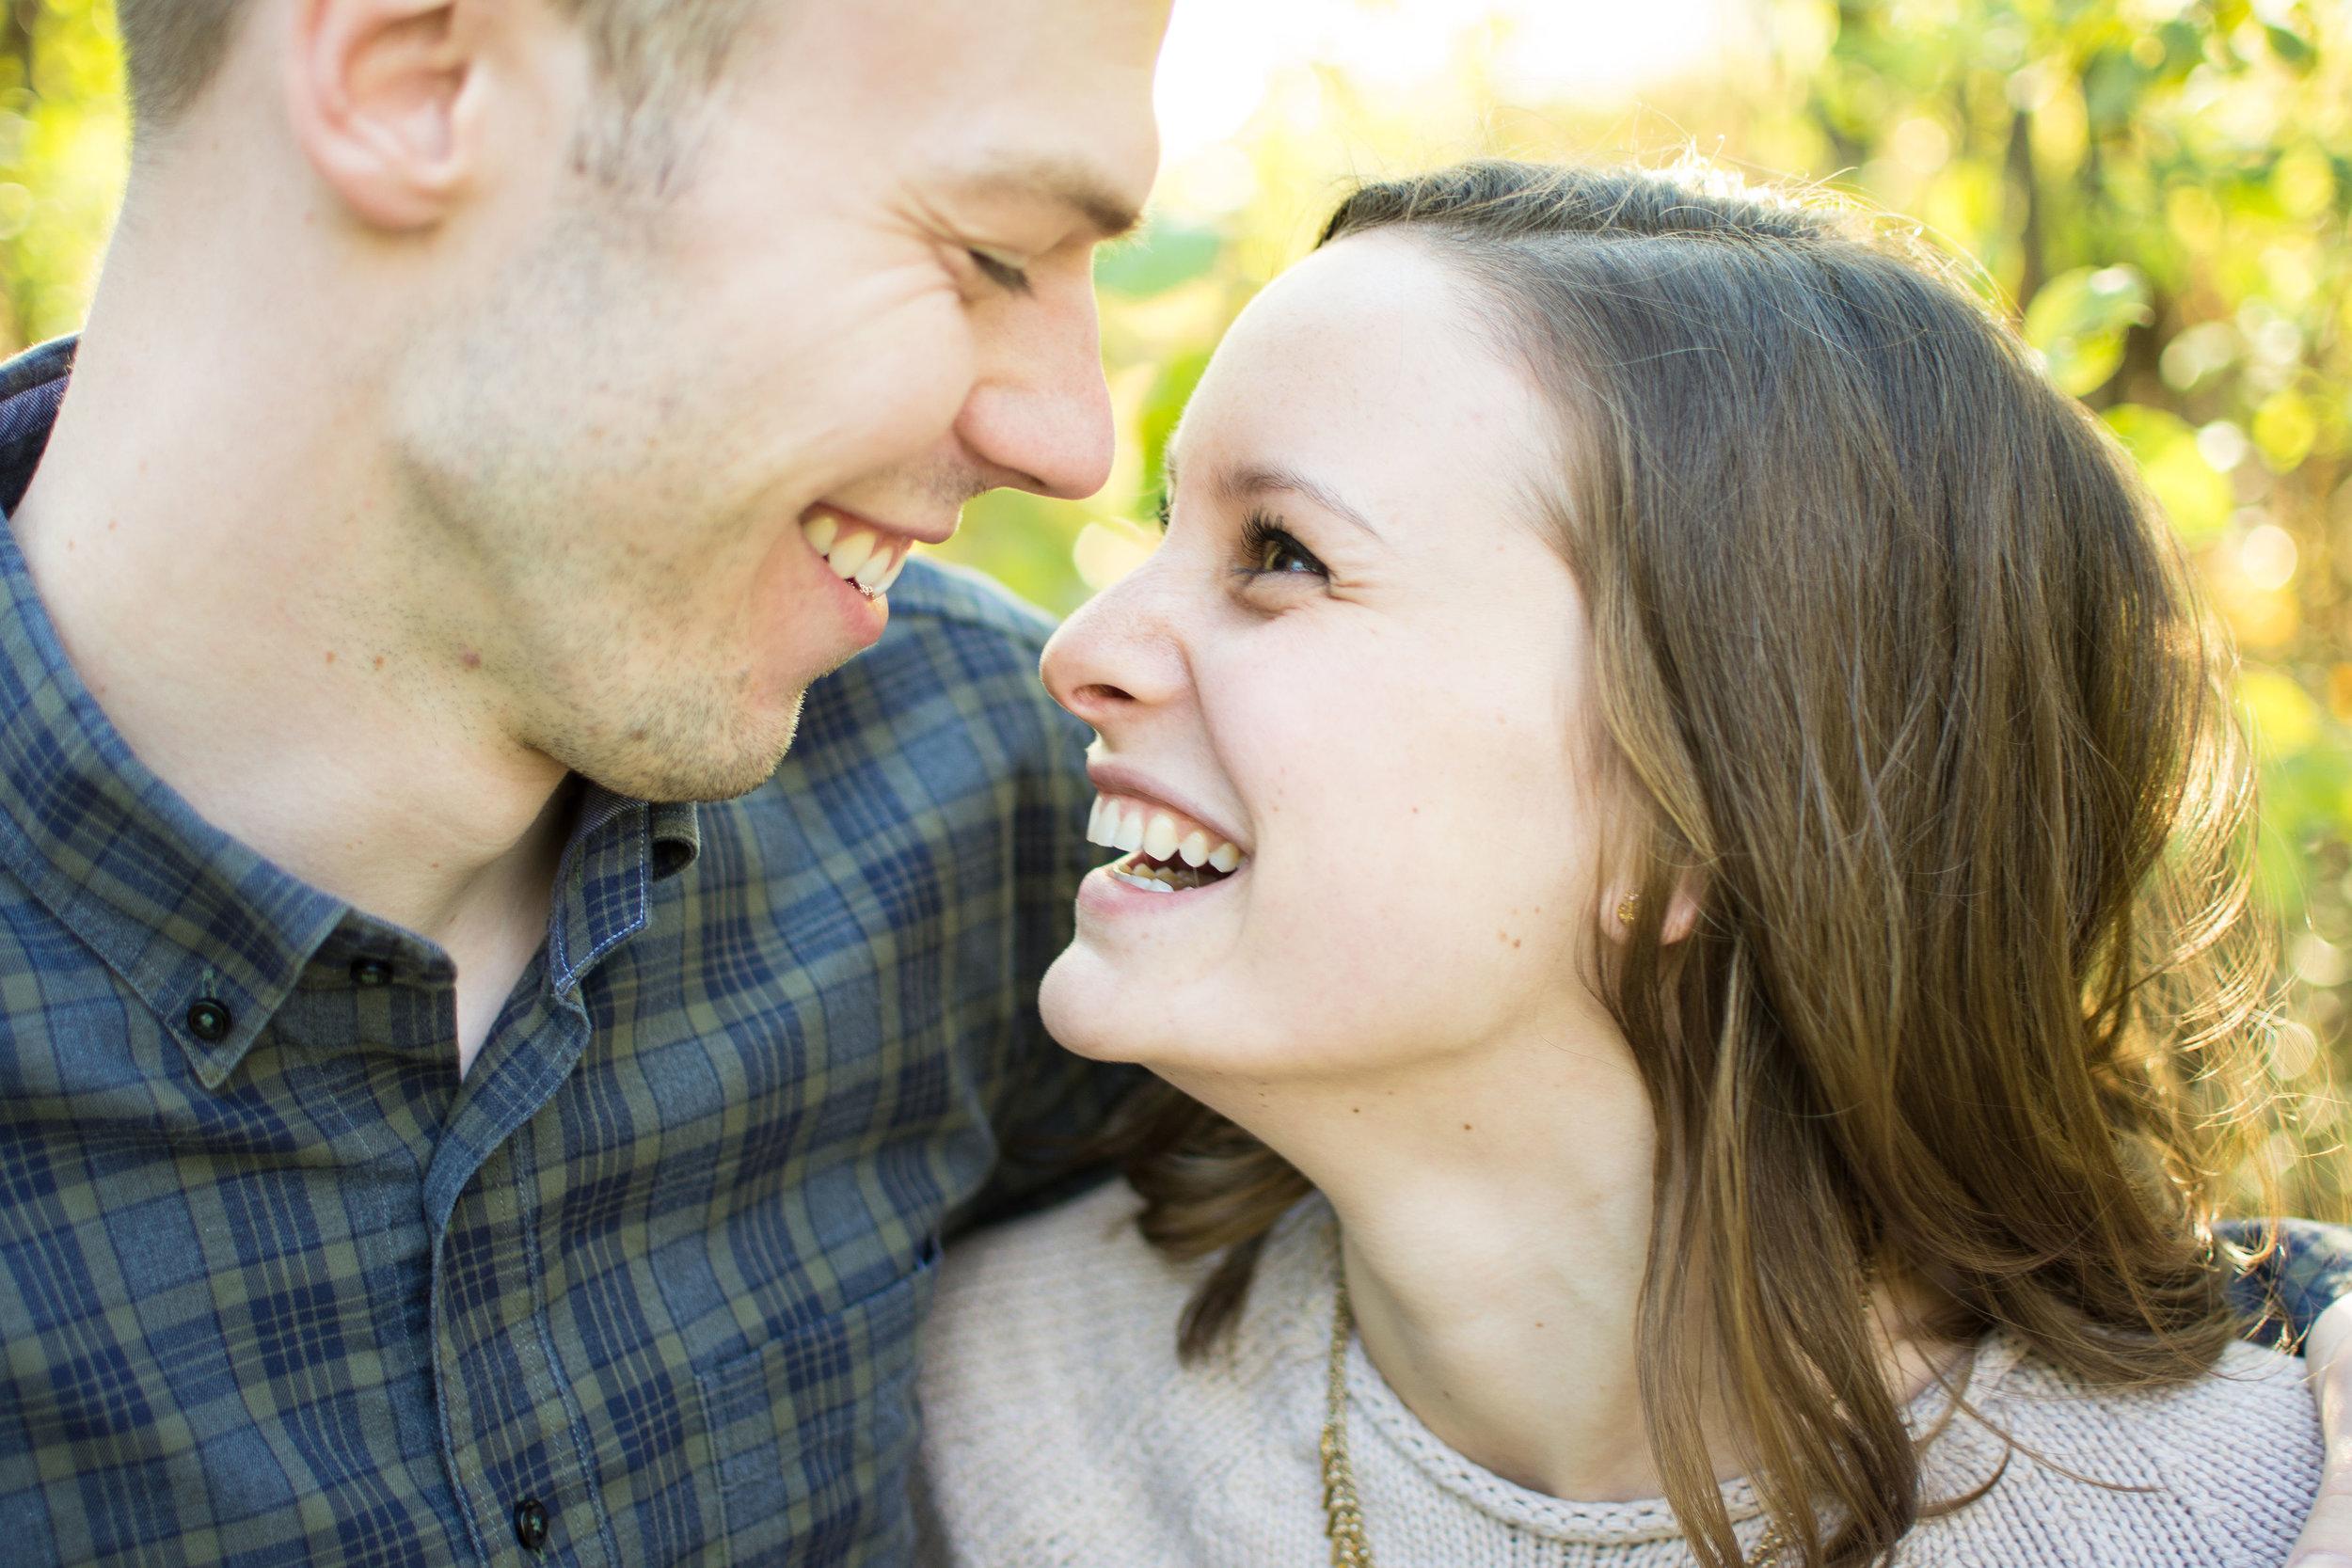 Minneapolis Wedding Photographer | Light and Airy Wedding Photographer | Light and Airy | Modern Bride | St. Louis Park Bride | Engagement Photos | MN Bride